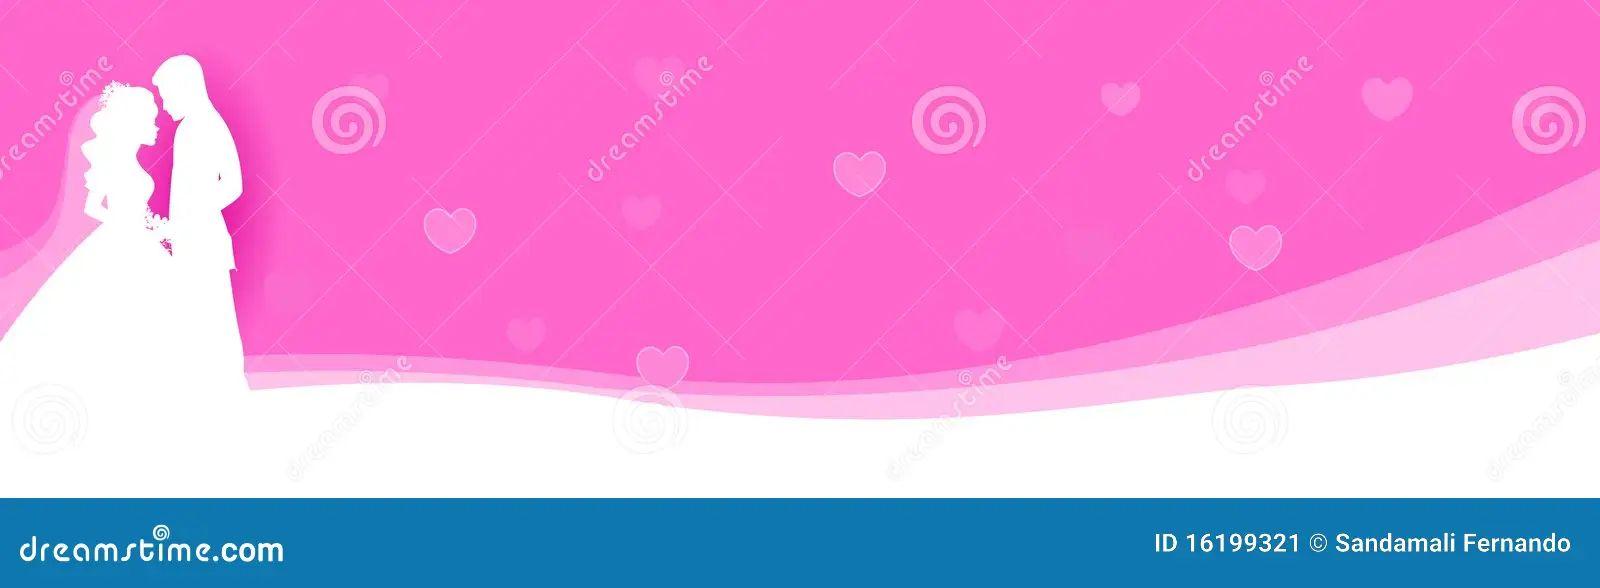 banner design for wedding